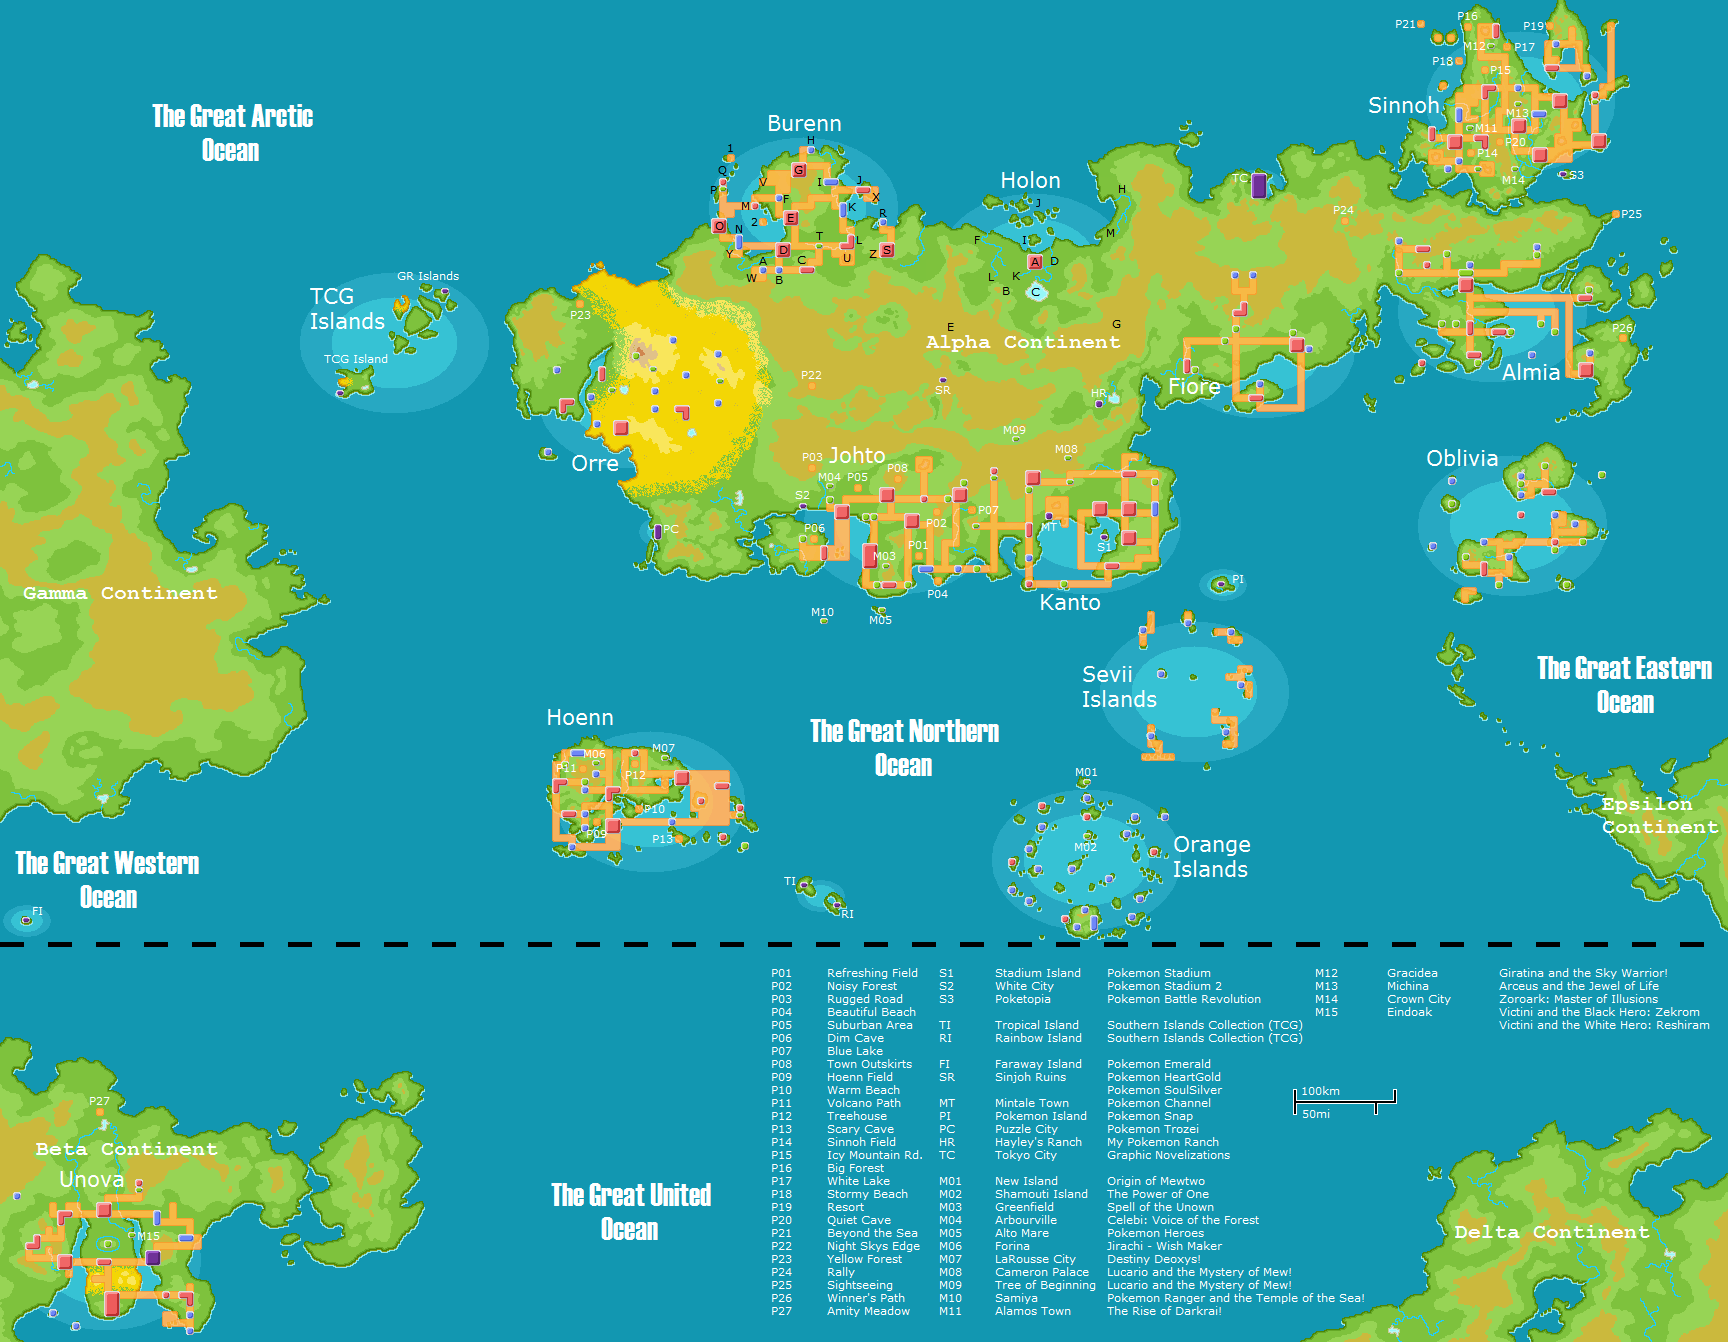 my pokemon world map v60 by jamisonhartley